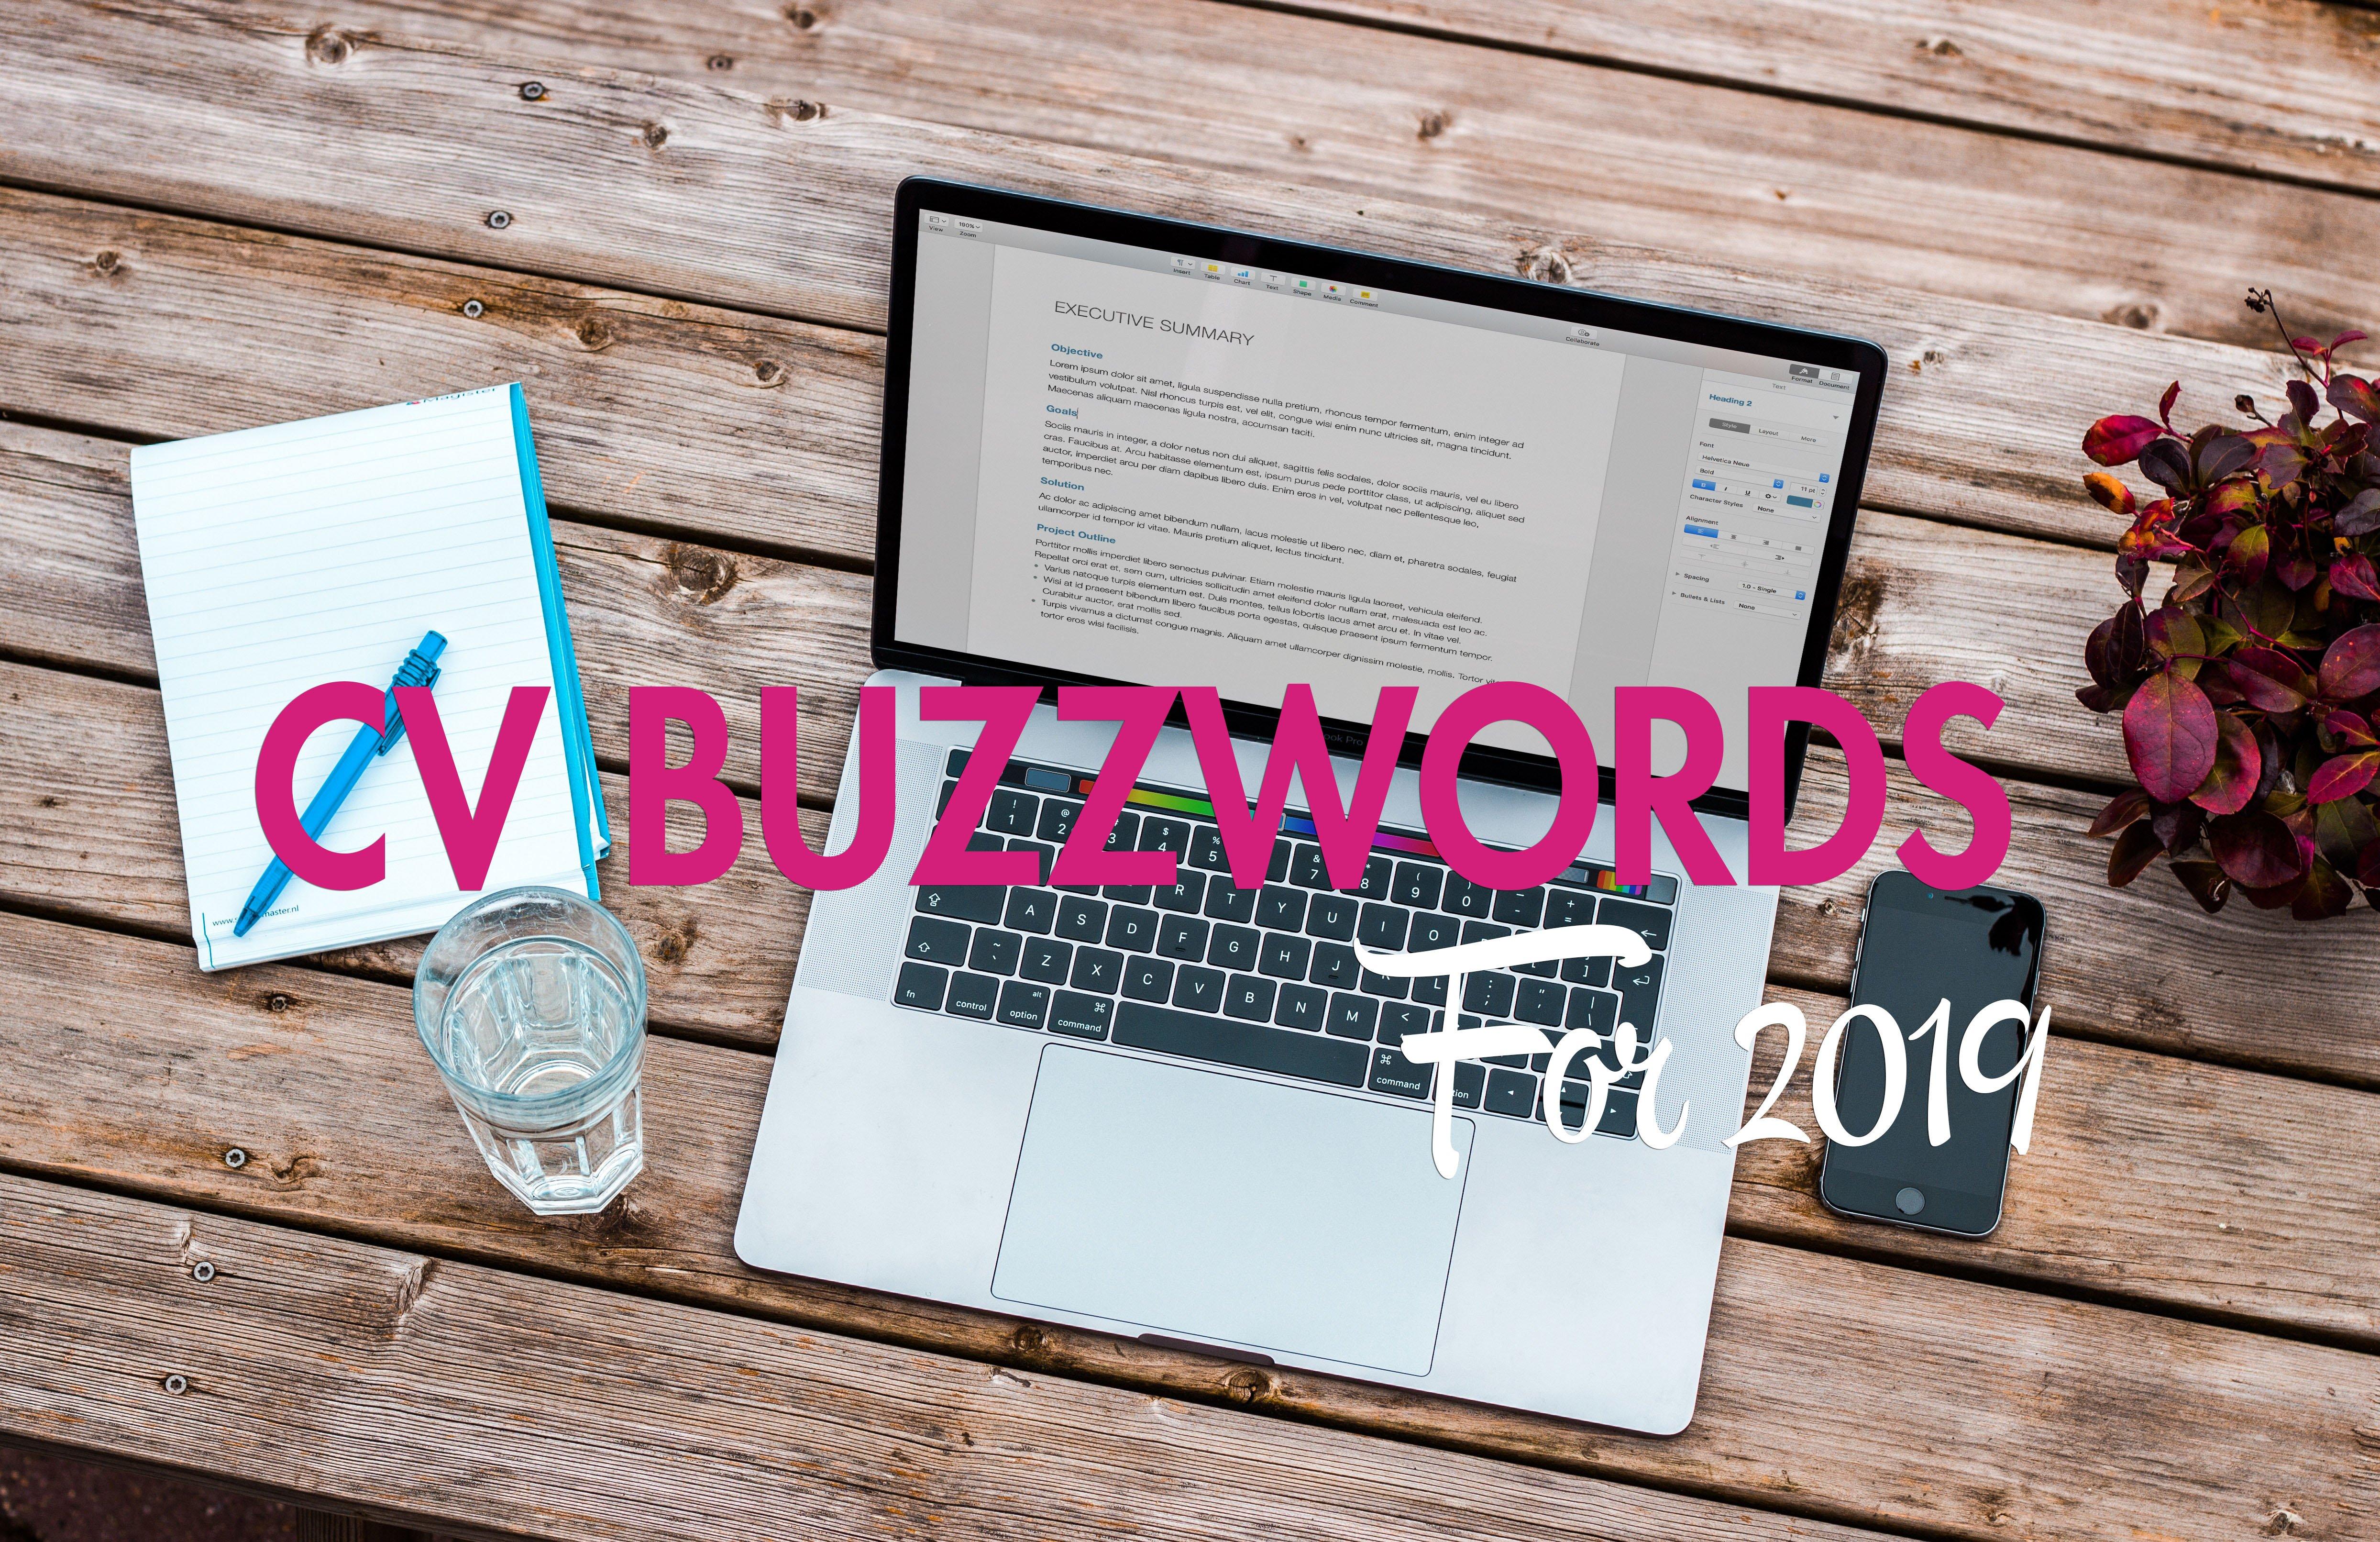 cv buzzwords 2019